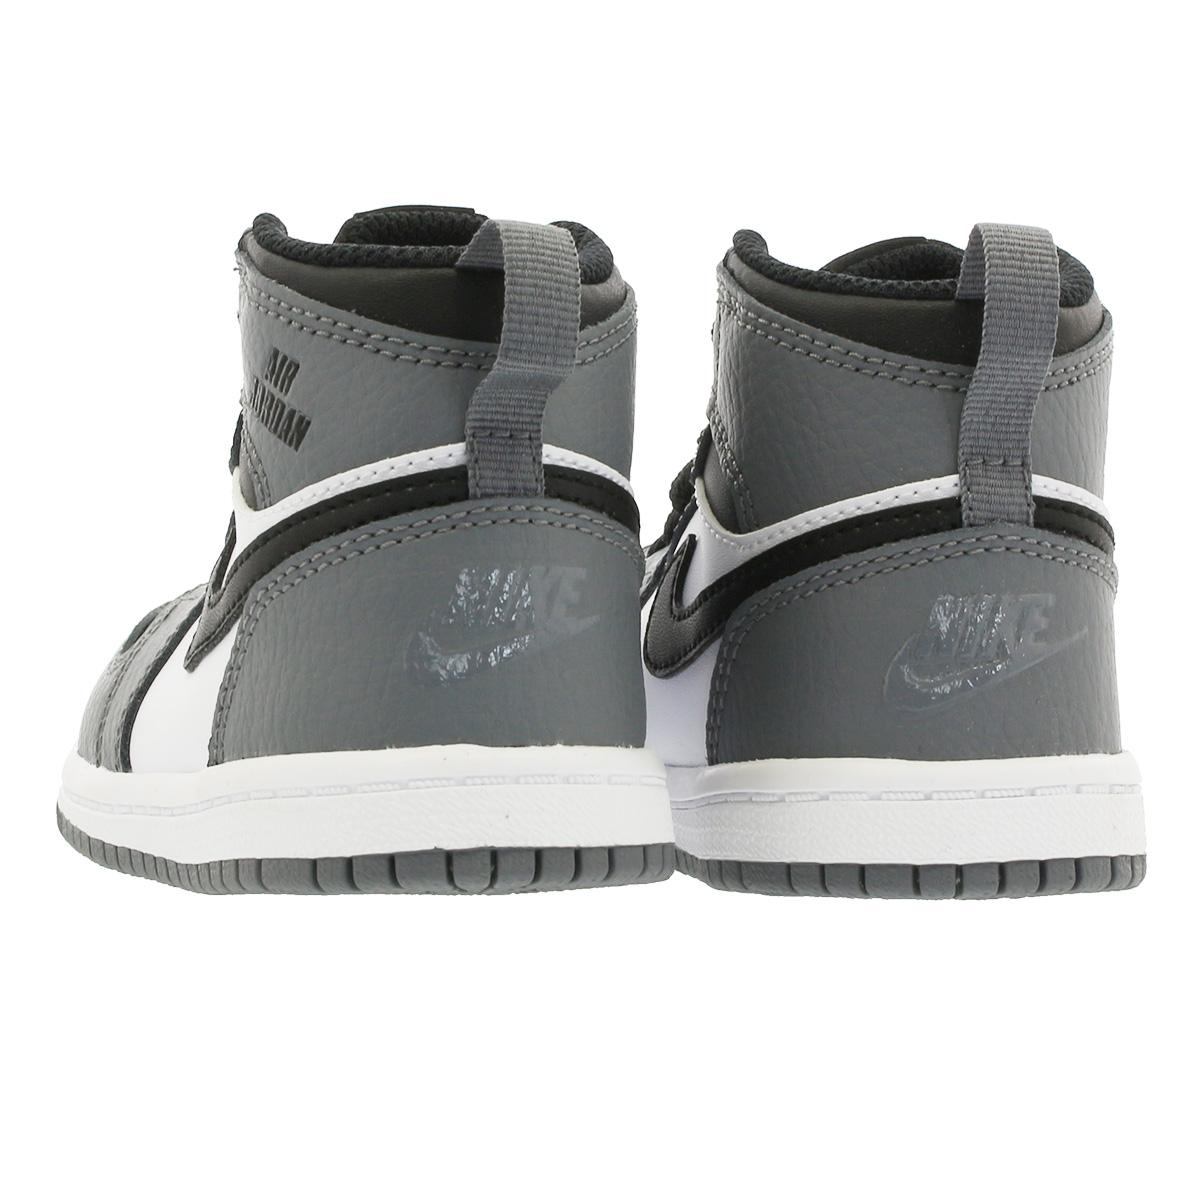 19a95253984ddf 1 NIKE AIR JORDAN RETRO 1 HI BT Nike Air Jordan nostalgic high BT COOL  GREY WHITE BLACK